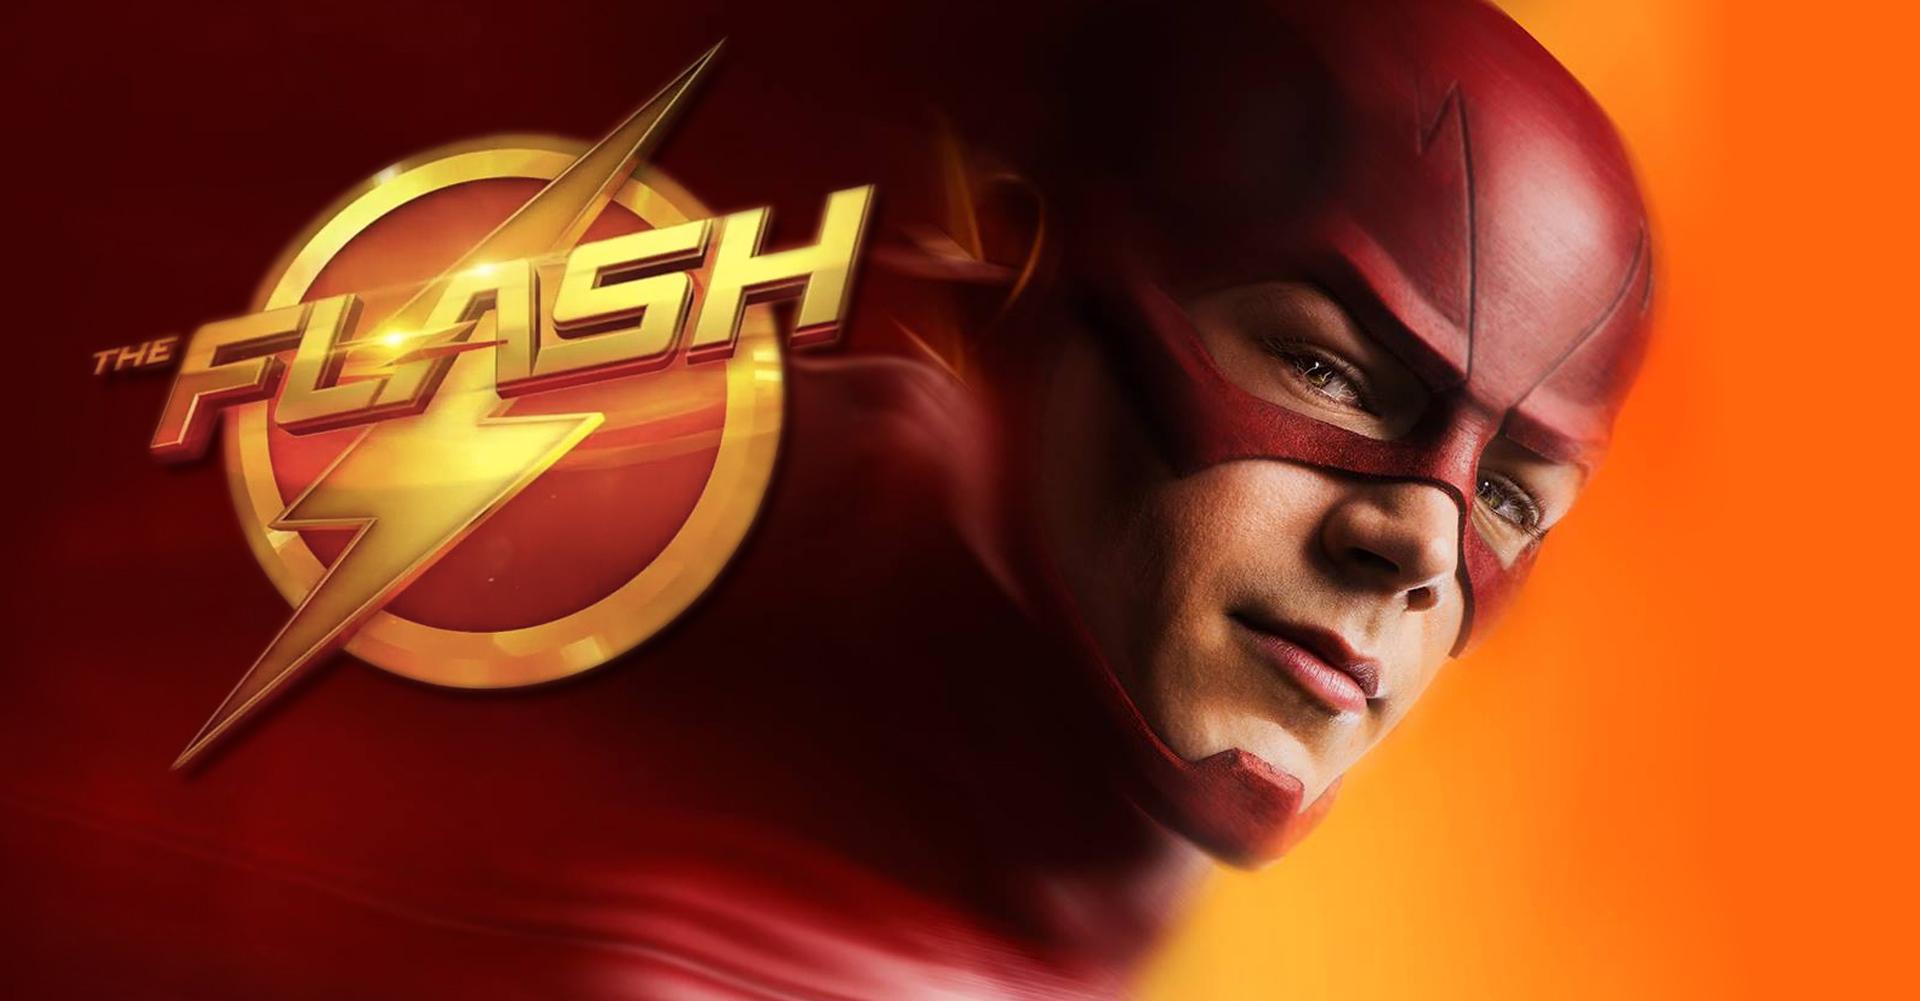 WATCH: Speedy Supercut Recaps 'The Flash' Season 2